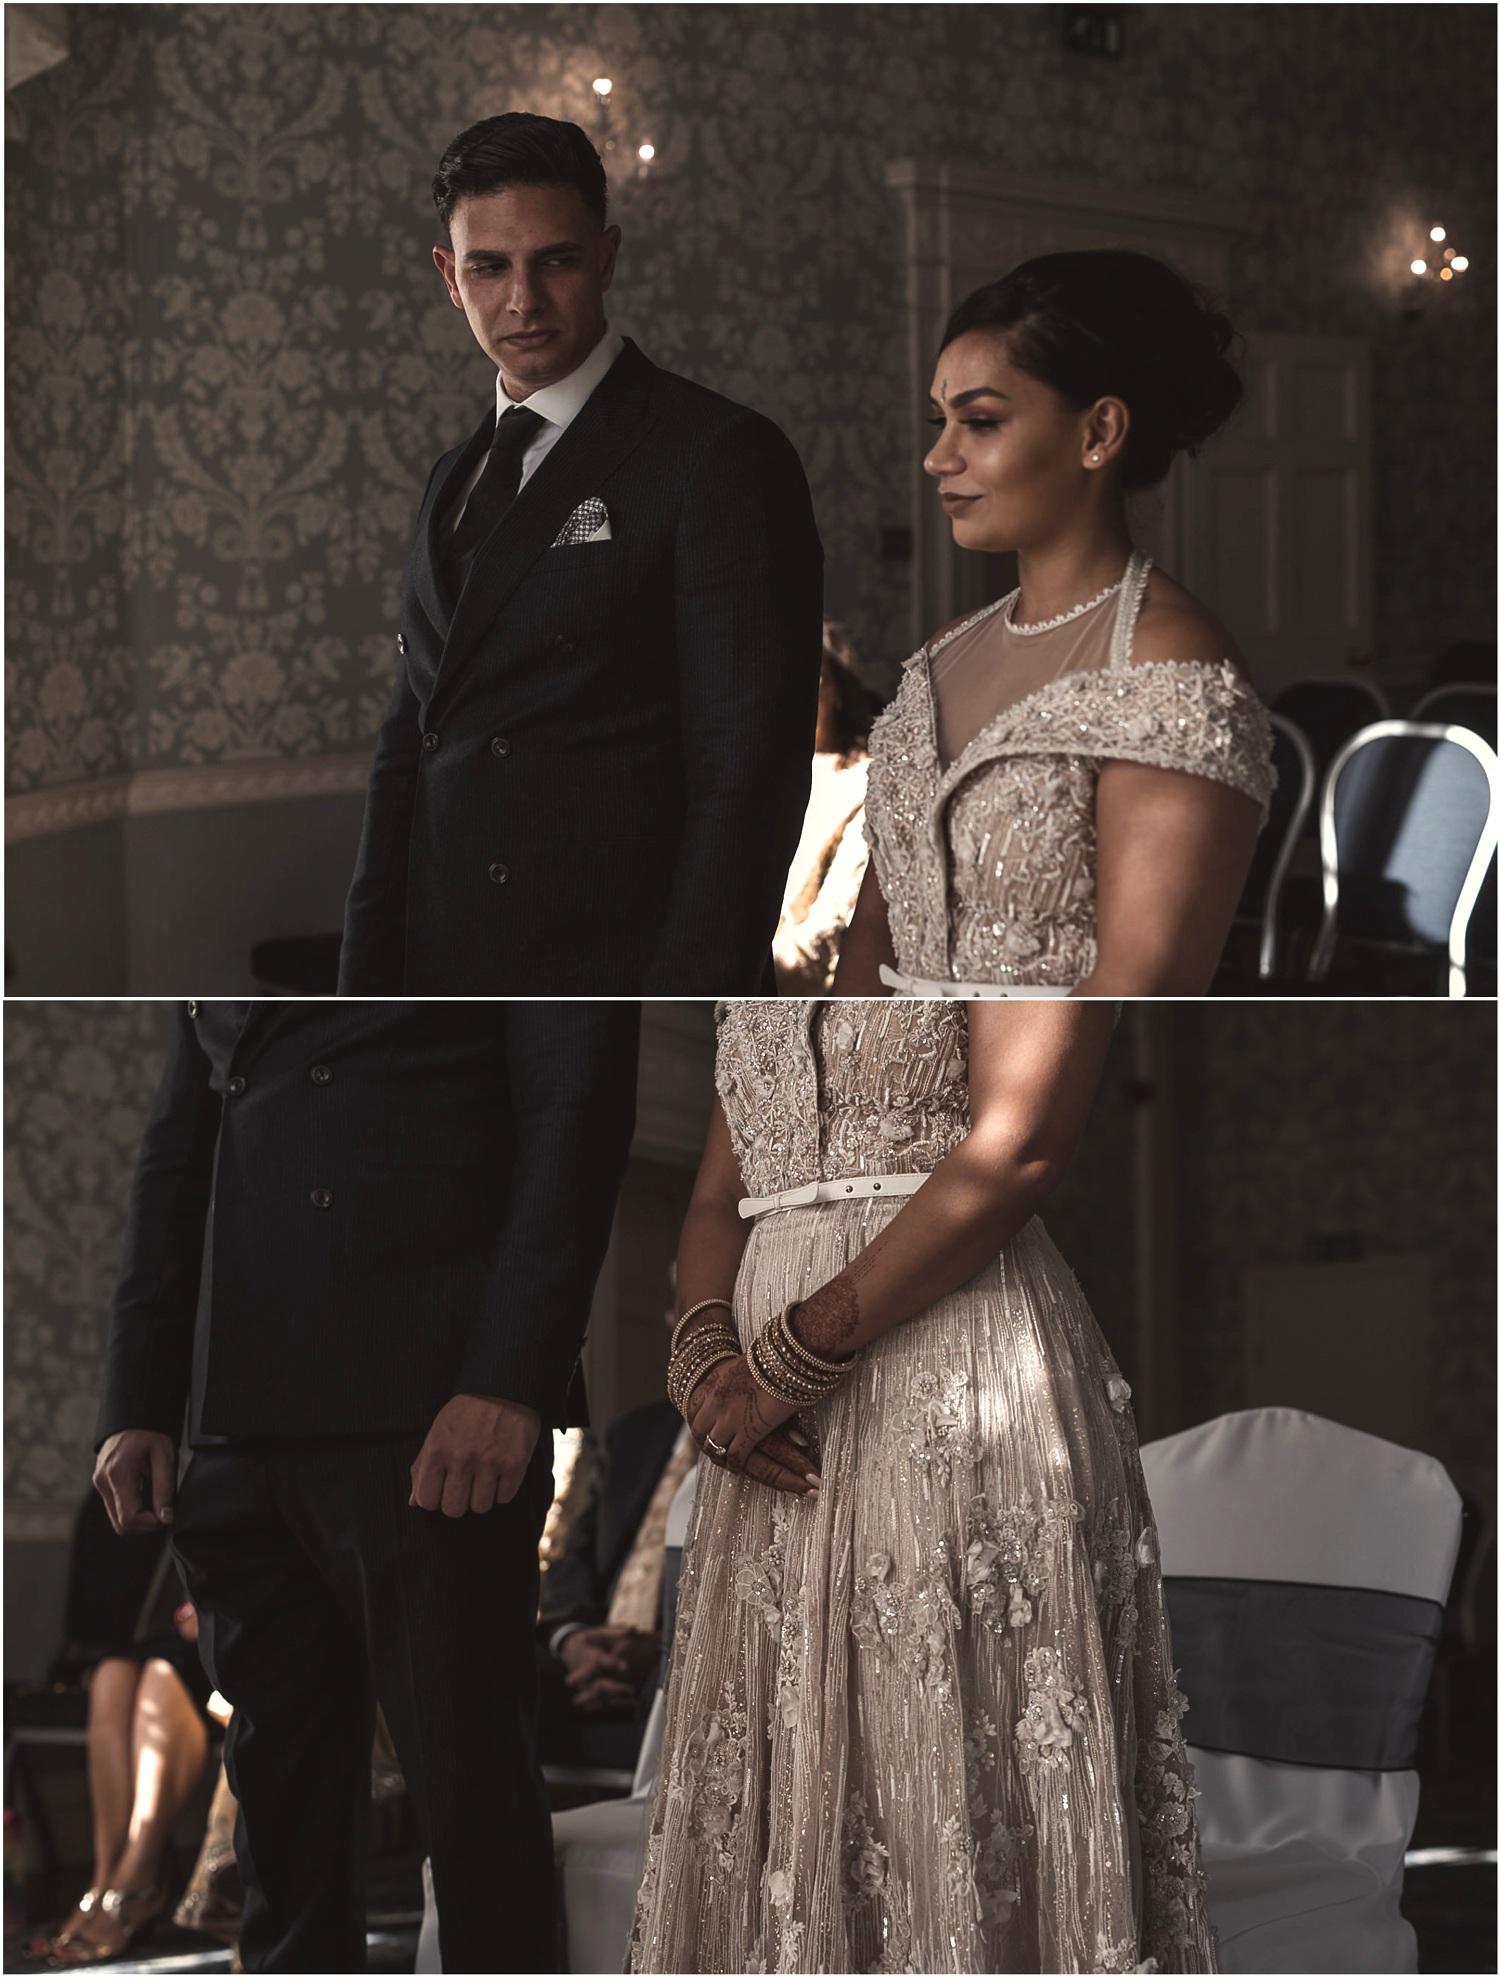 Langtons House civil ceremony